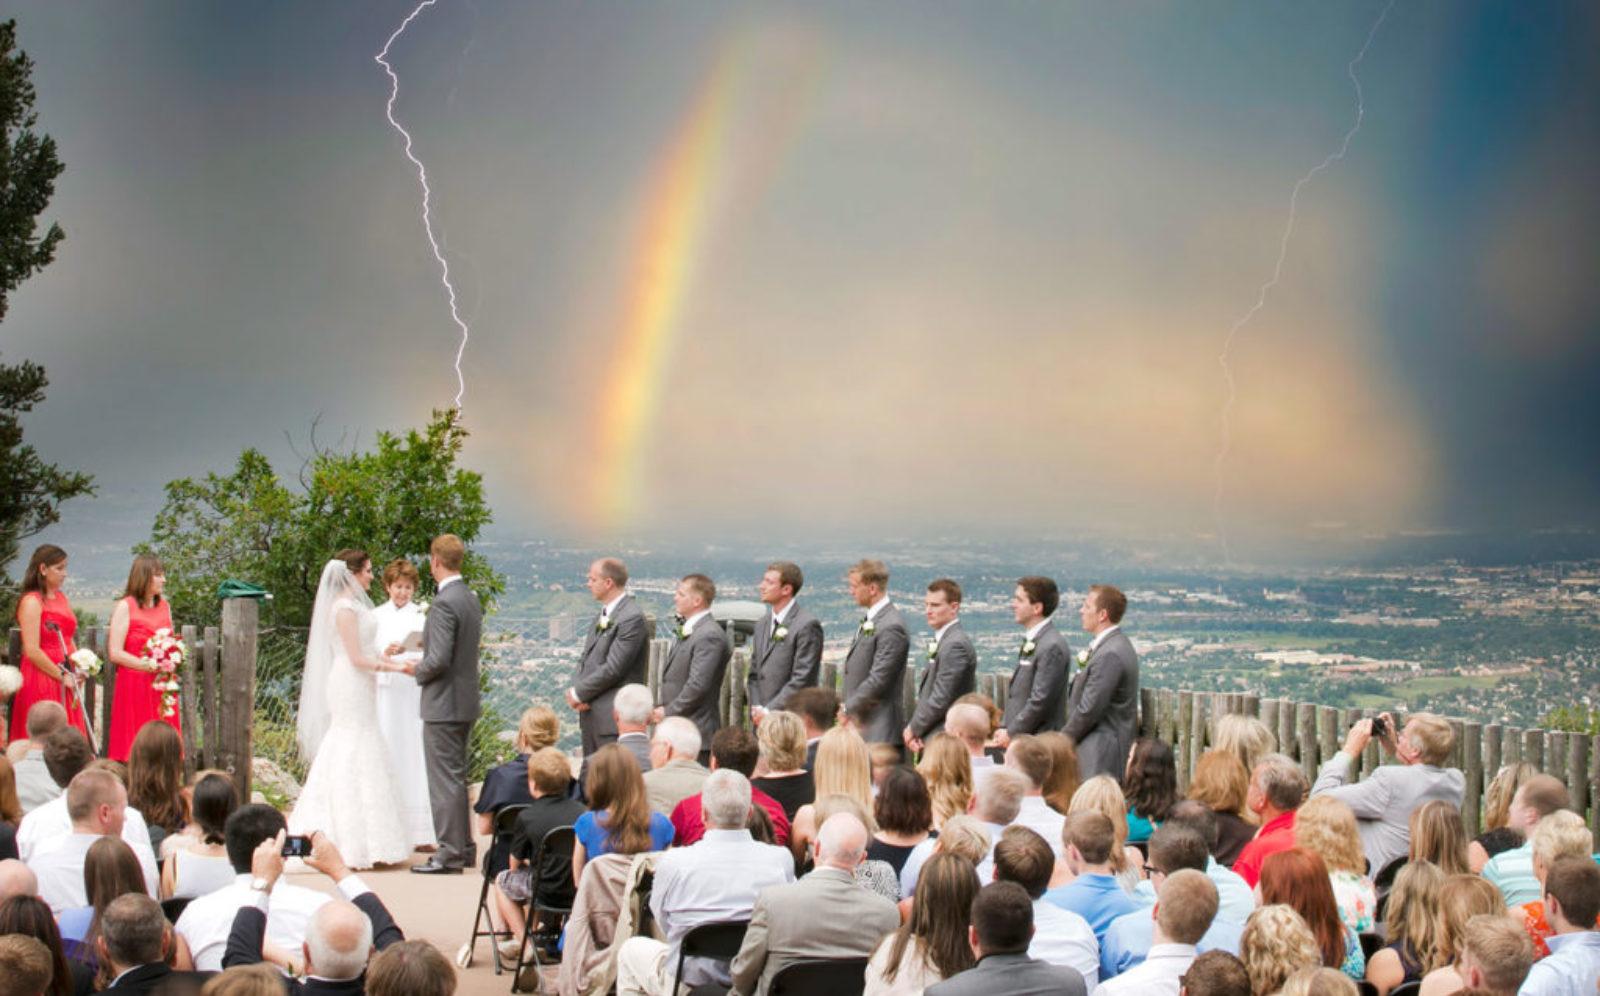 weddingphotographycoloradosprings_40-1024x638